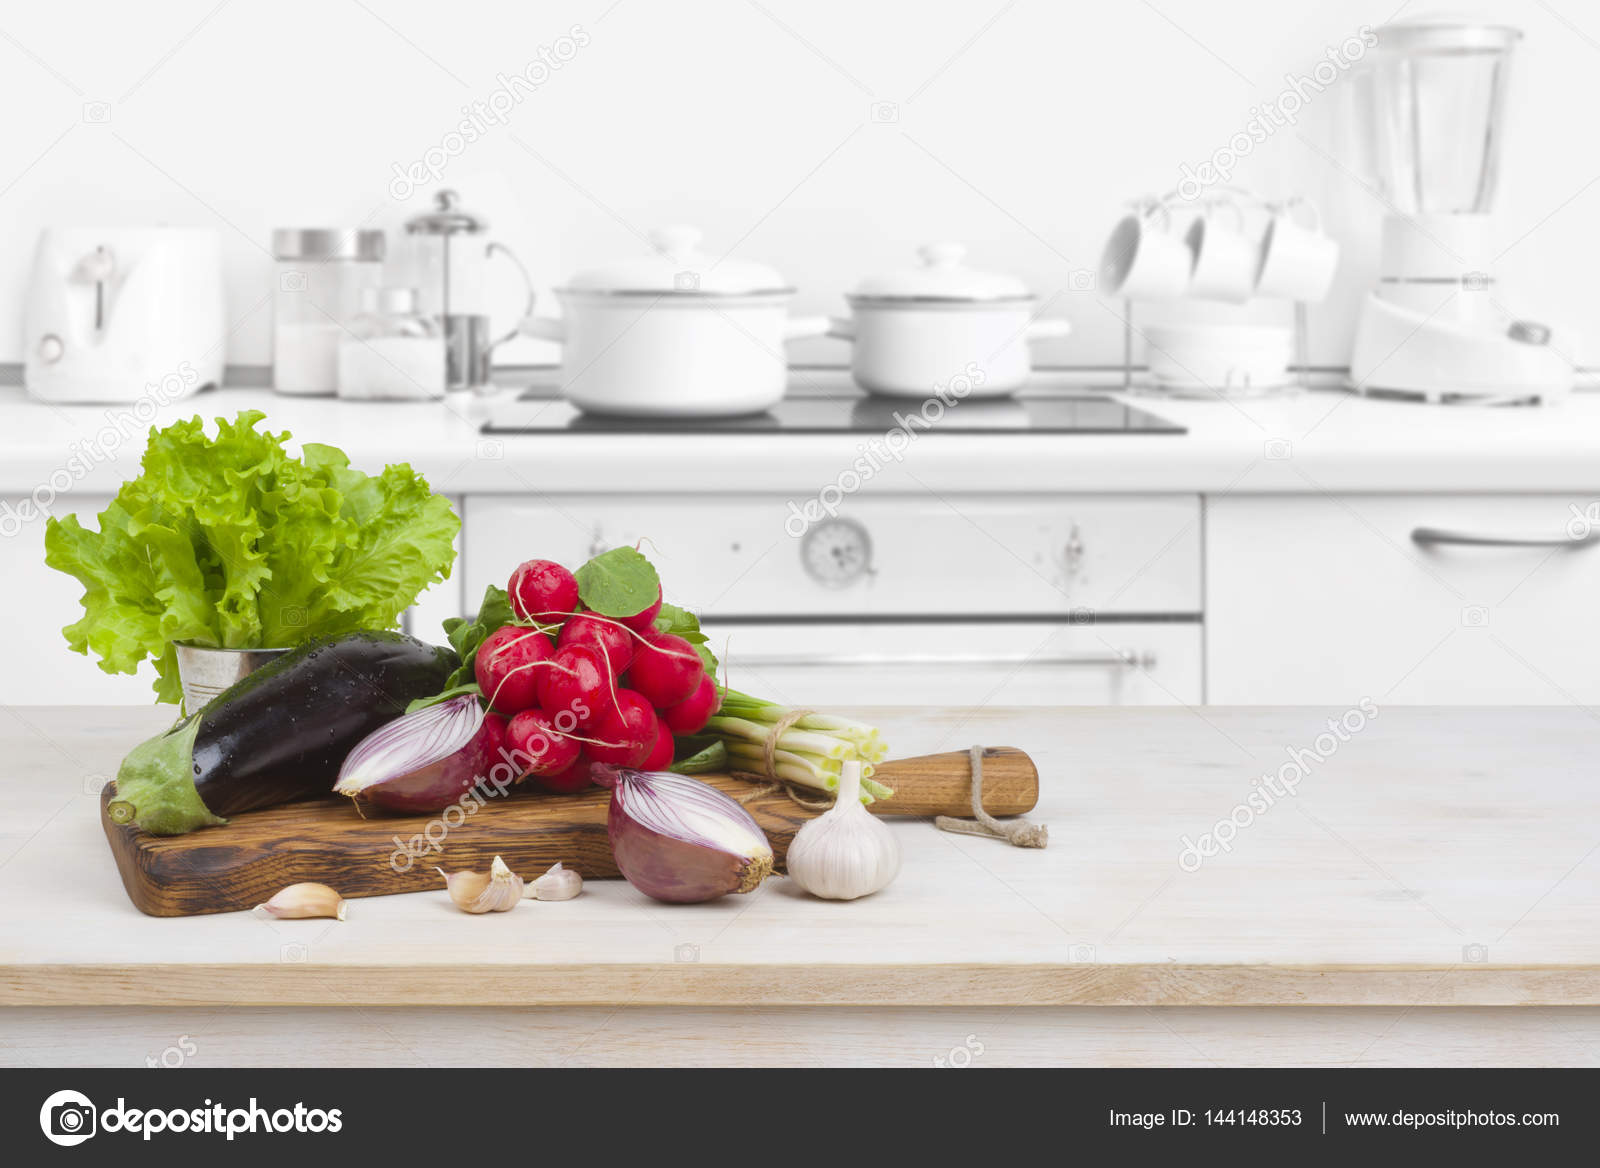 kitchen table high top best appliances 木桌和蔬菜在模糊的厨房内饰顶上 图库照片 c didecs 144148353